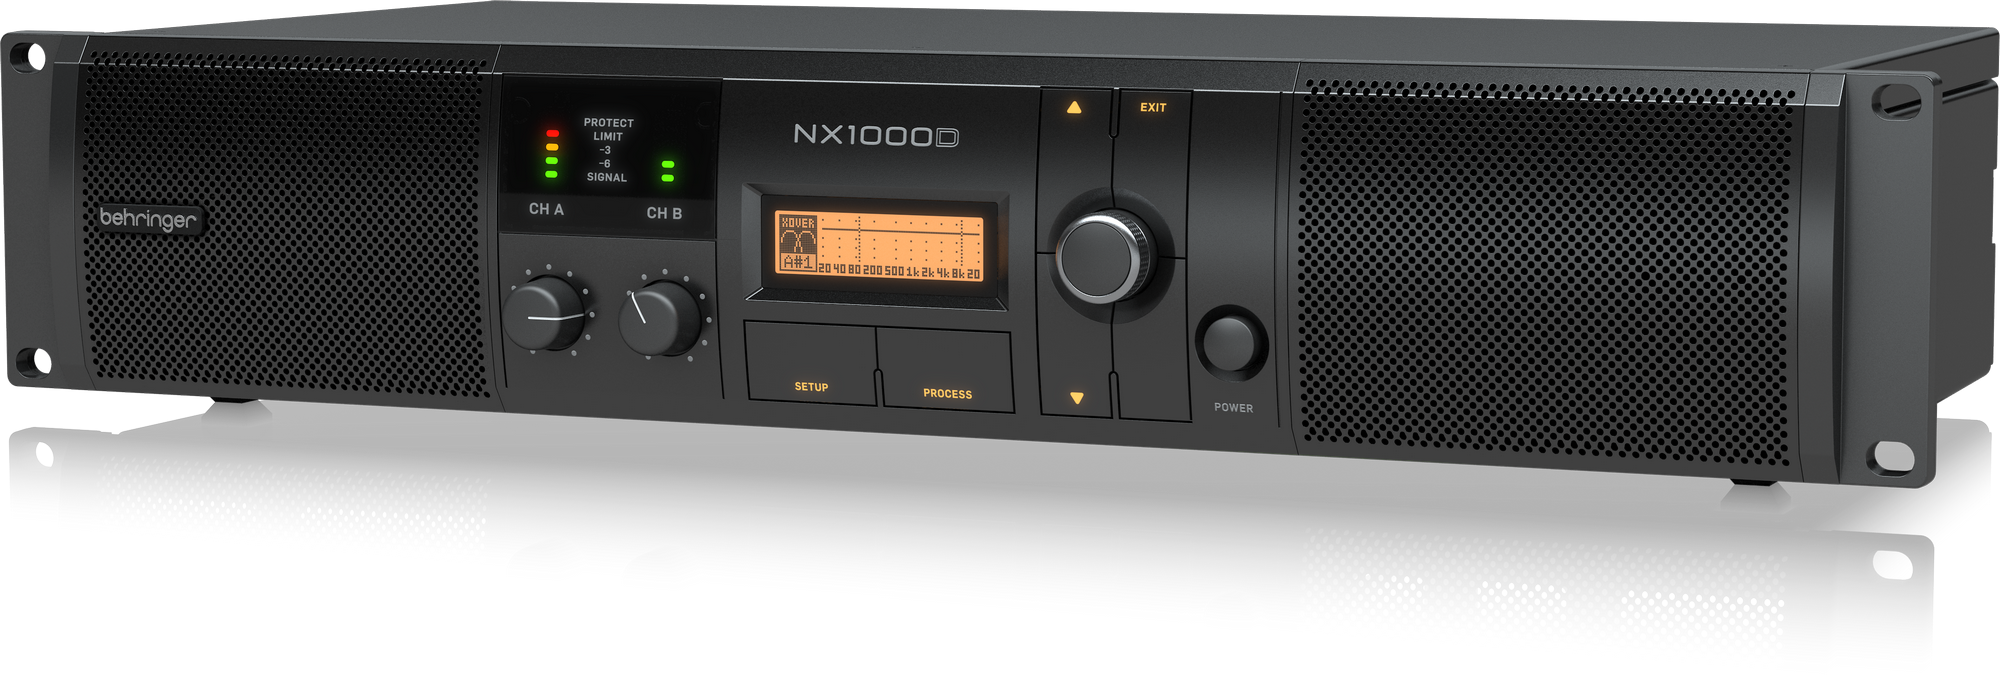 Behringer NX1000D Amplifier